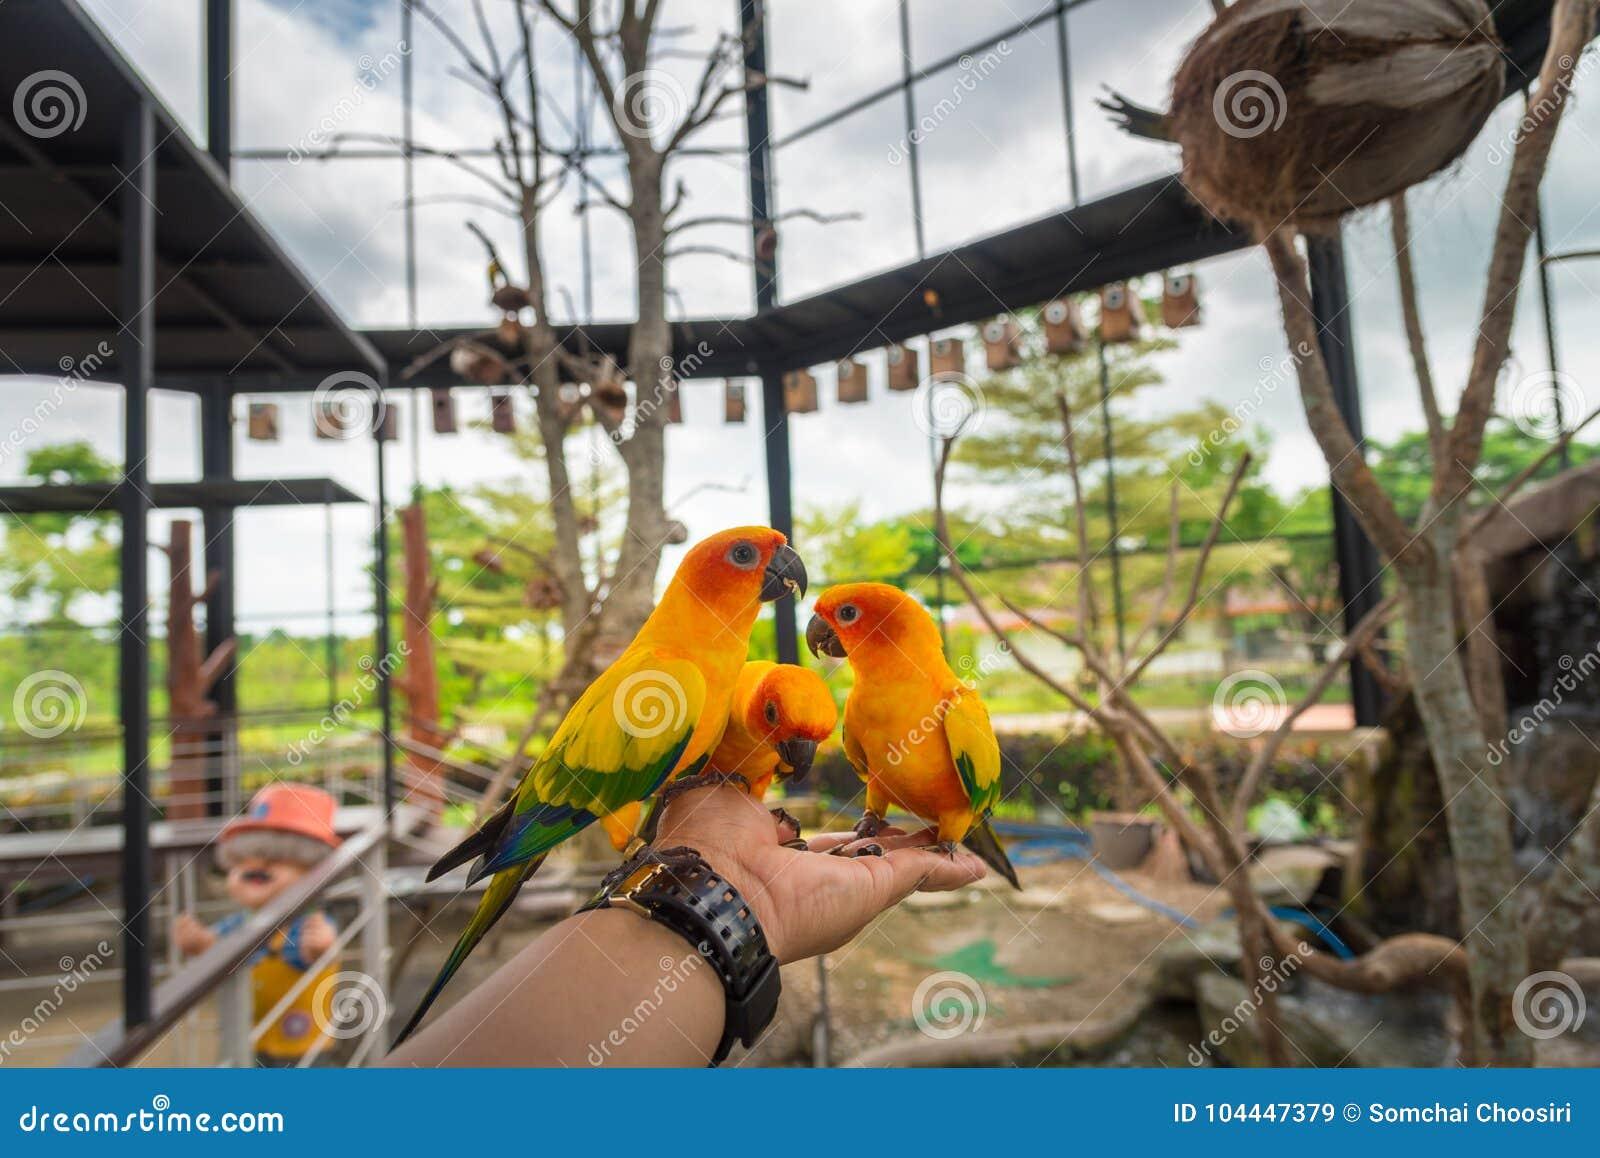 Pássaro amarelo do papagaio, conure do sol